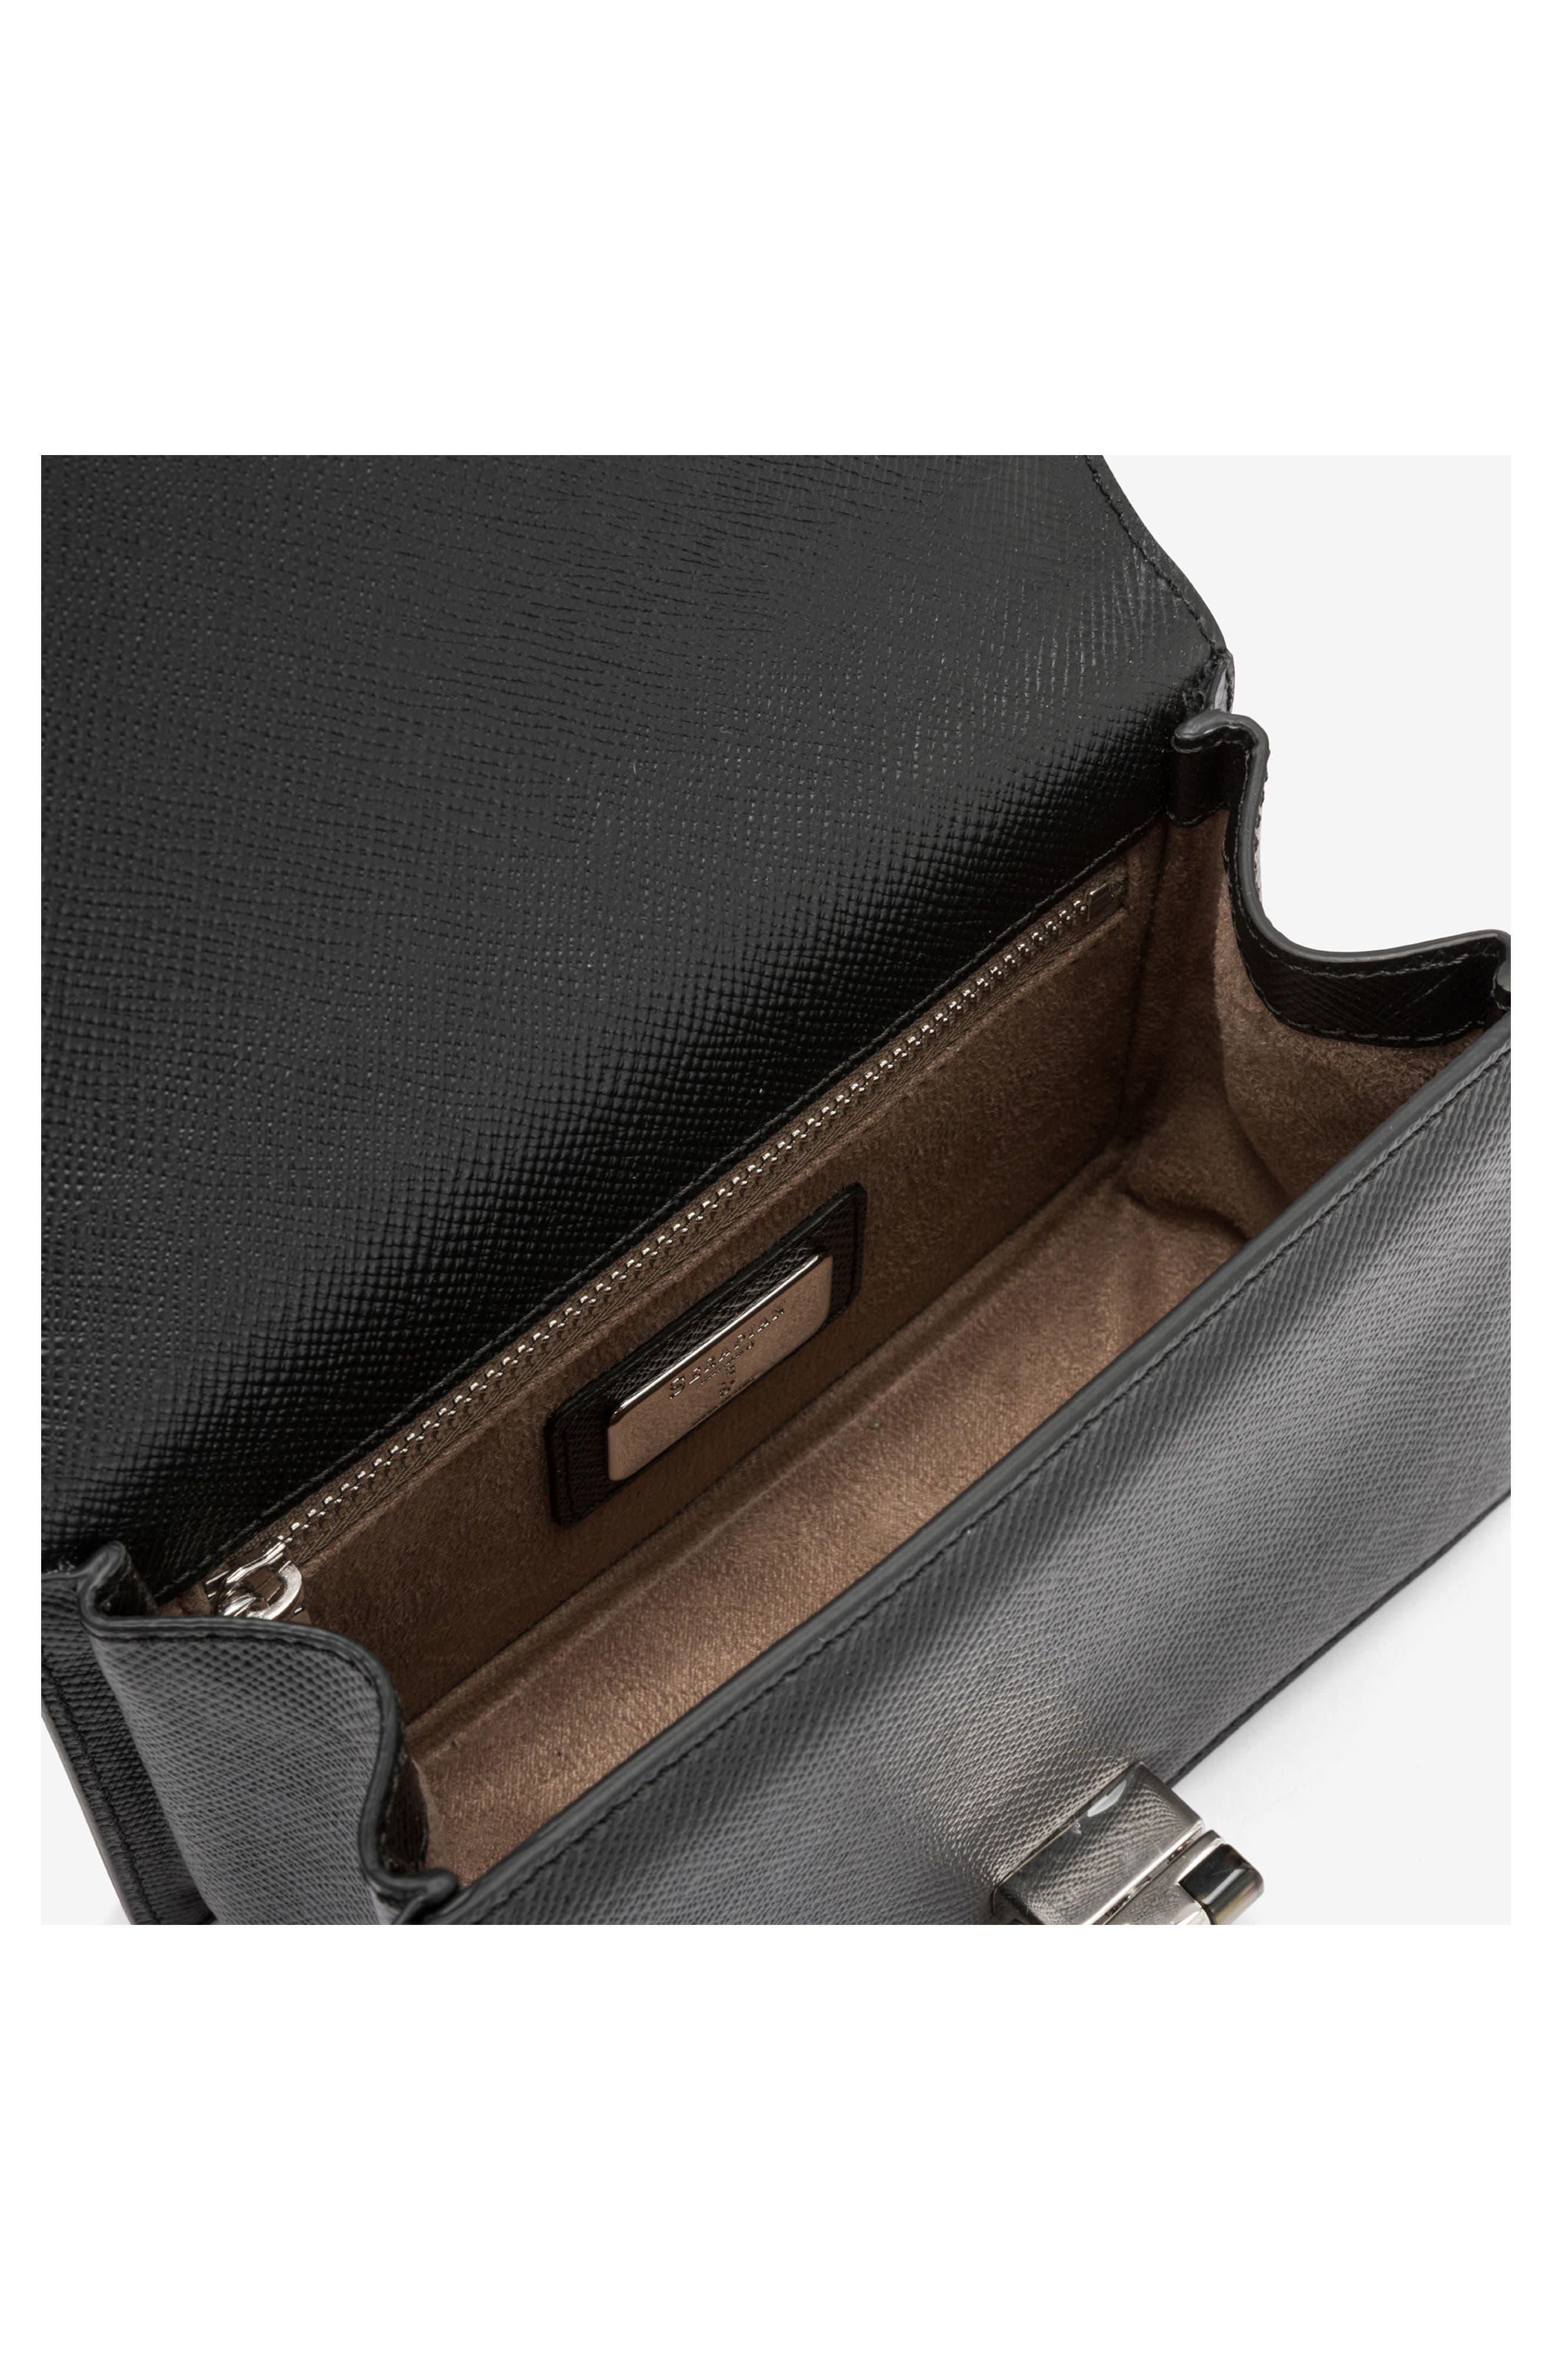 Mini Roberta Evolution Leather Crossbody Bag,                             Alternate thumbnail 3, color,                             Black